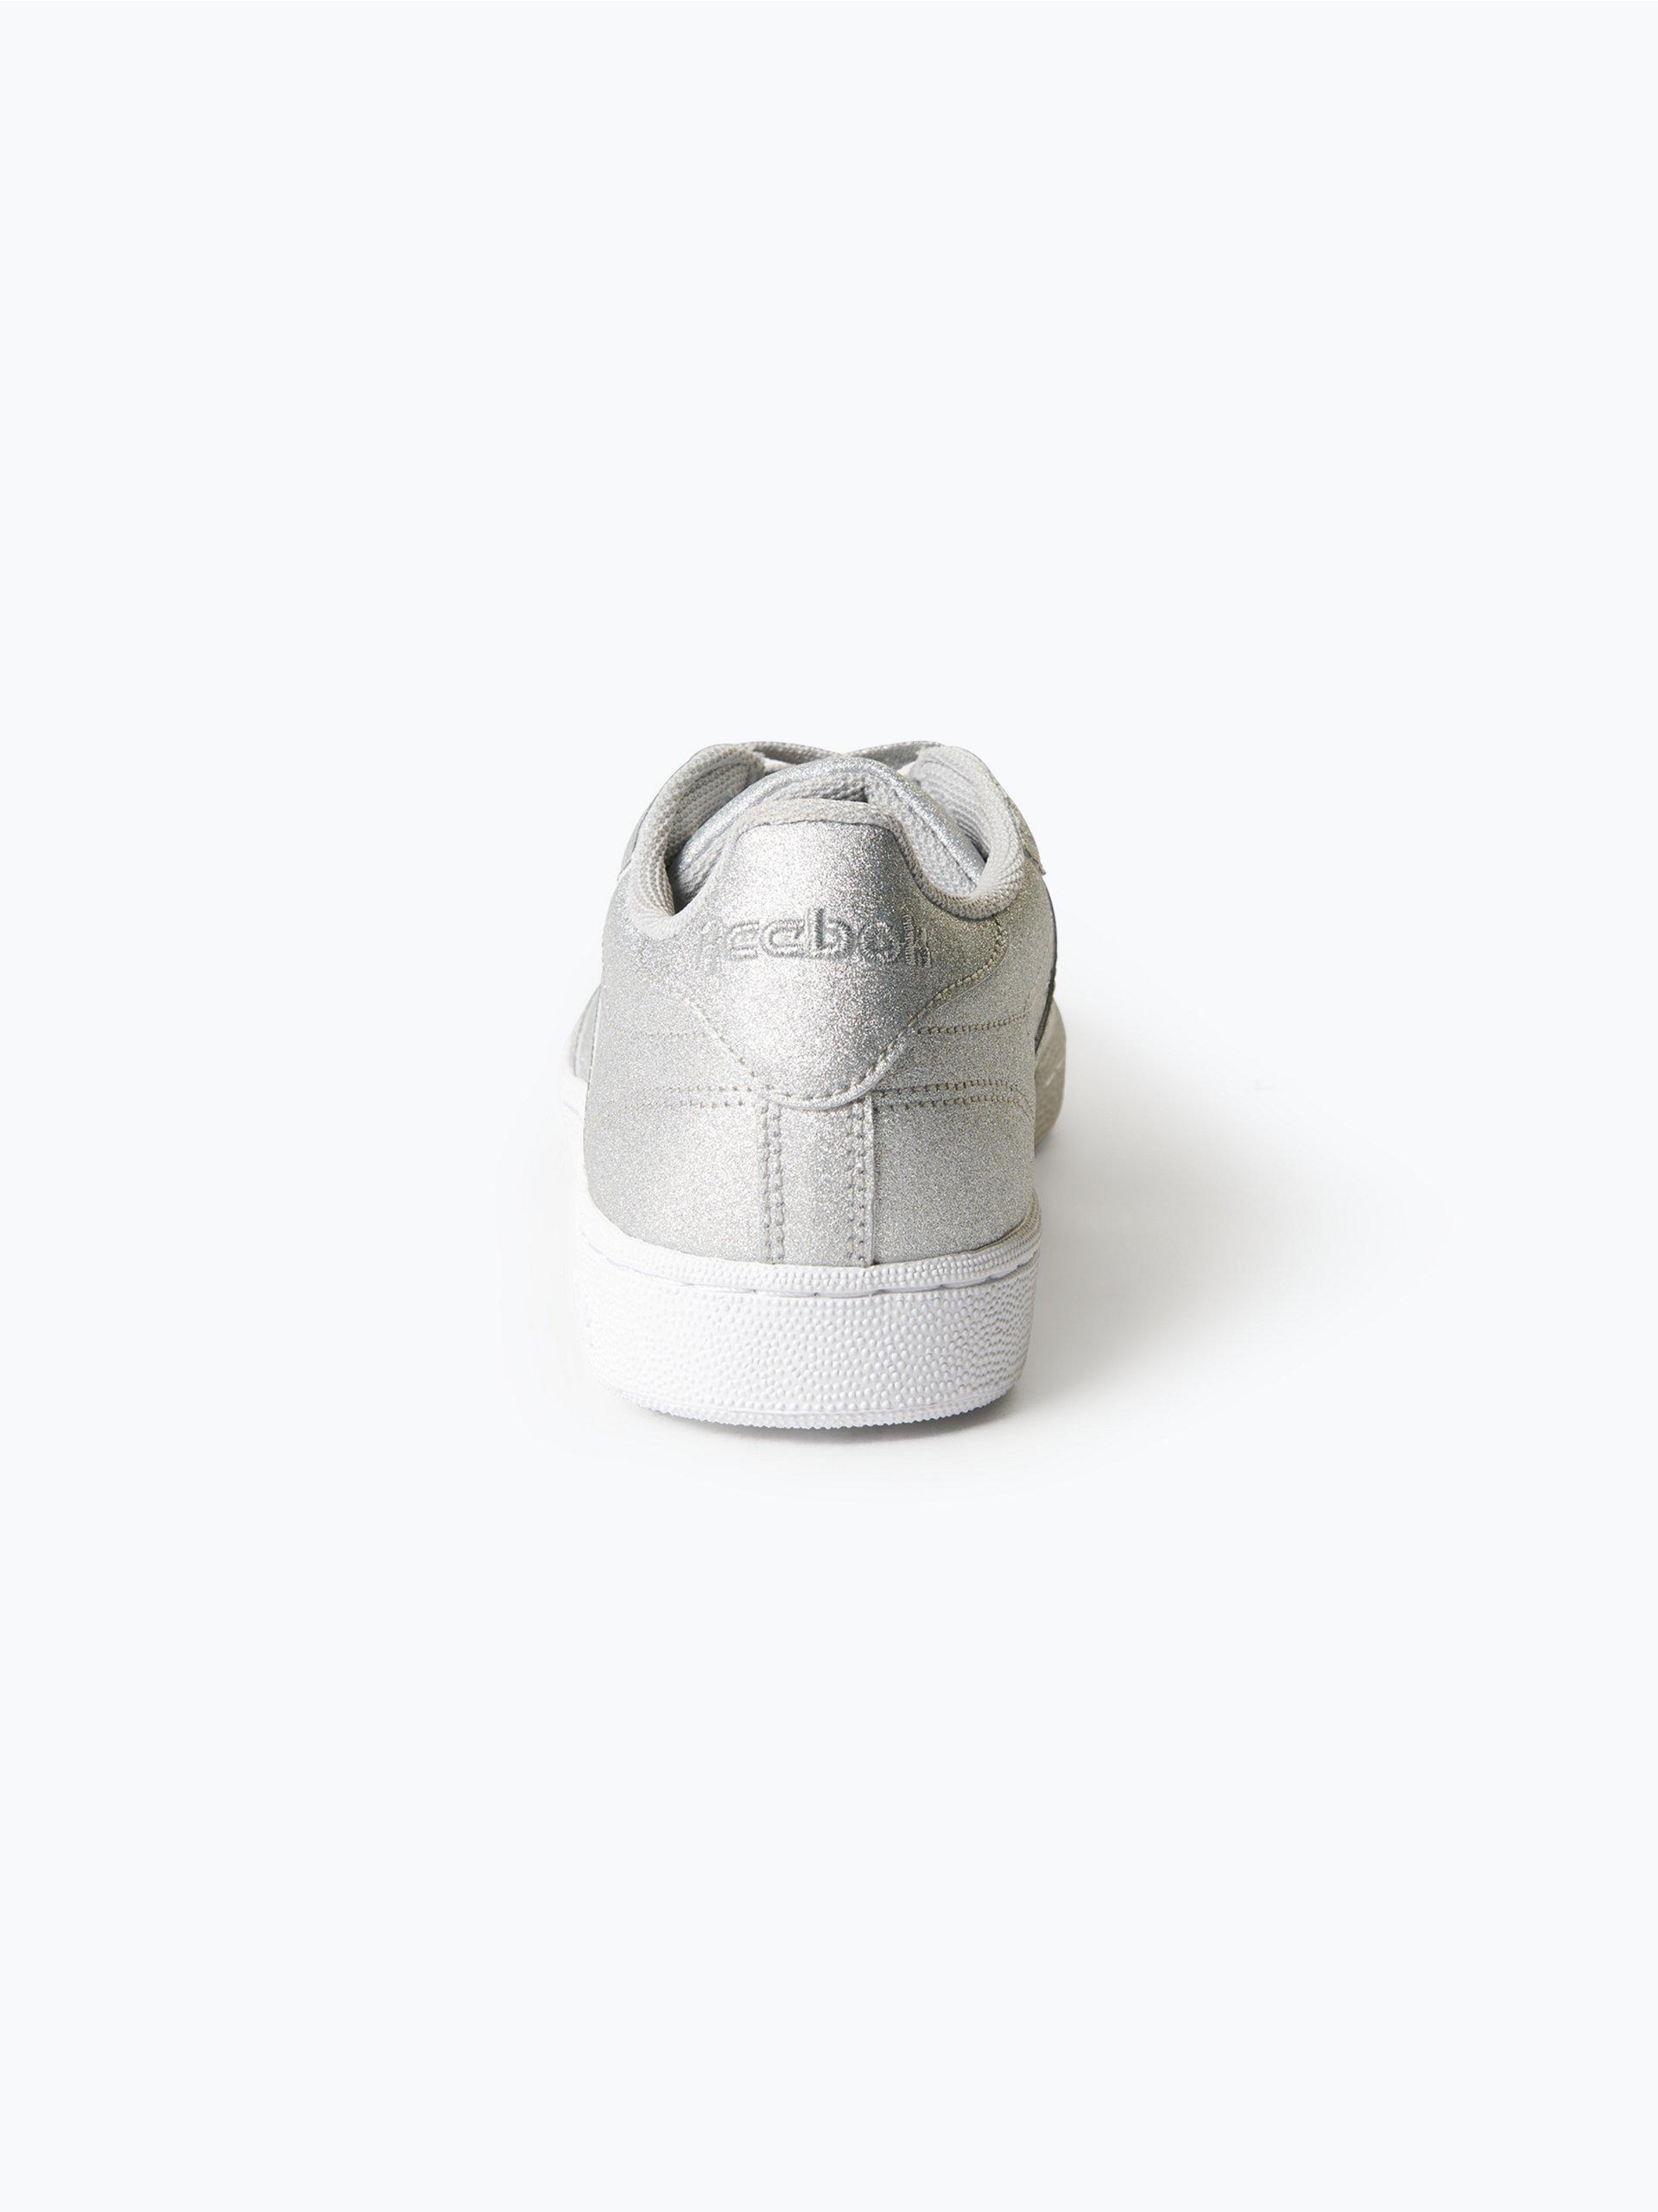 Reebok Damen Sneaker in Leder-Optik